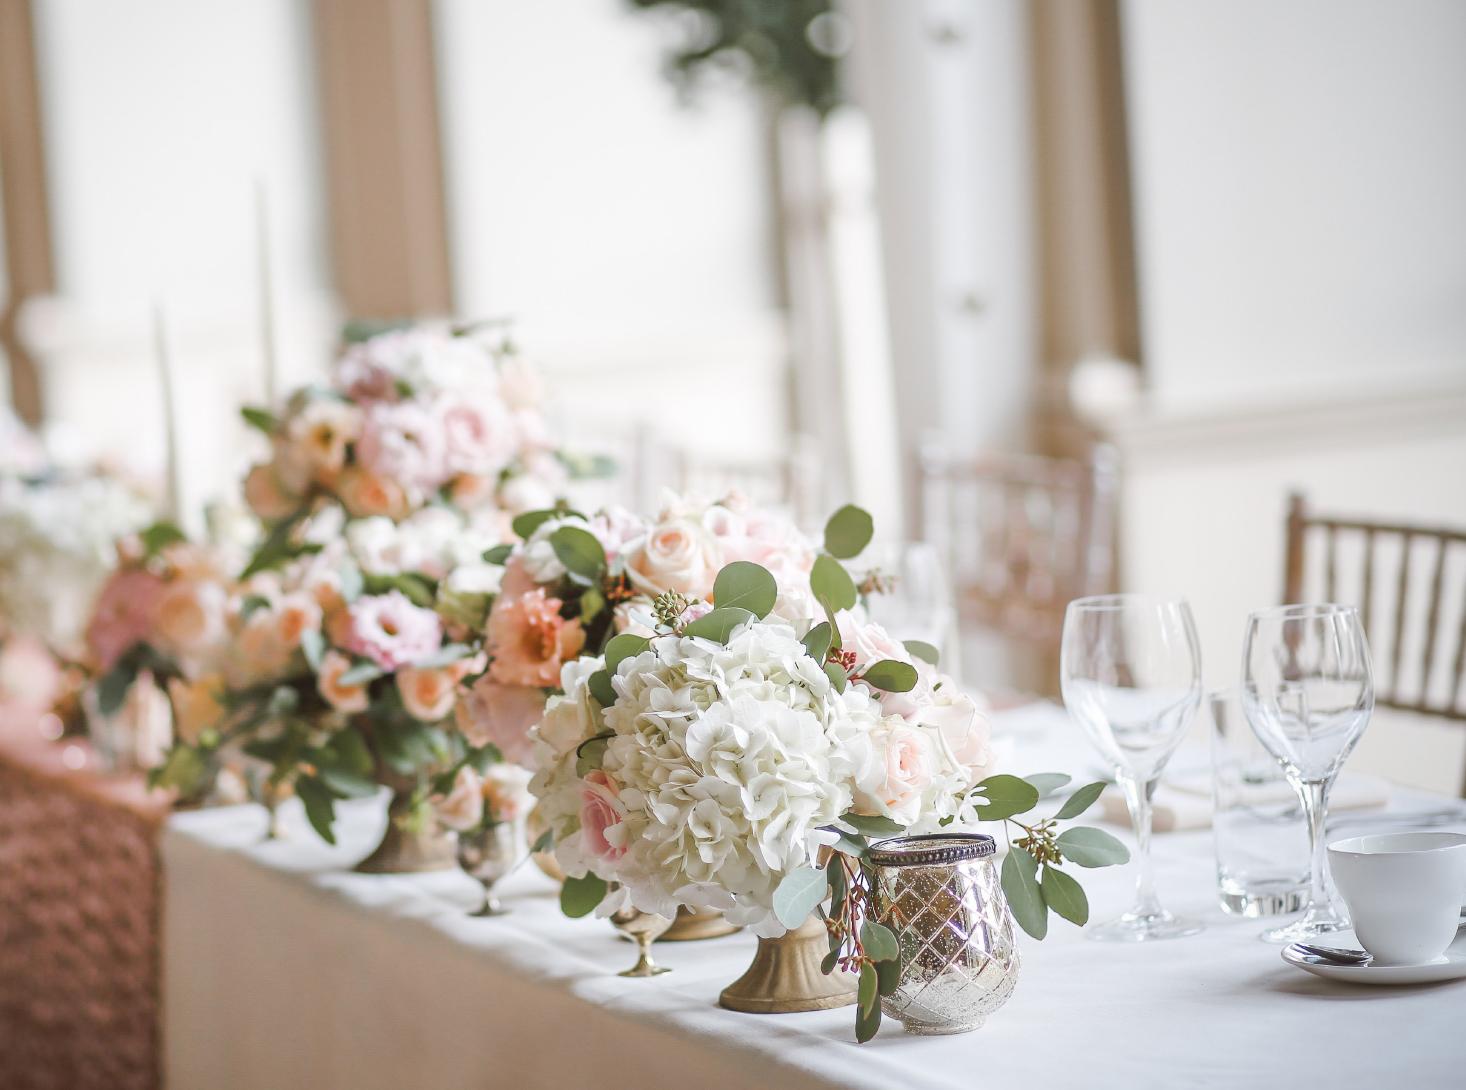 Elegant Flower Centerpieces